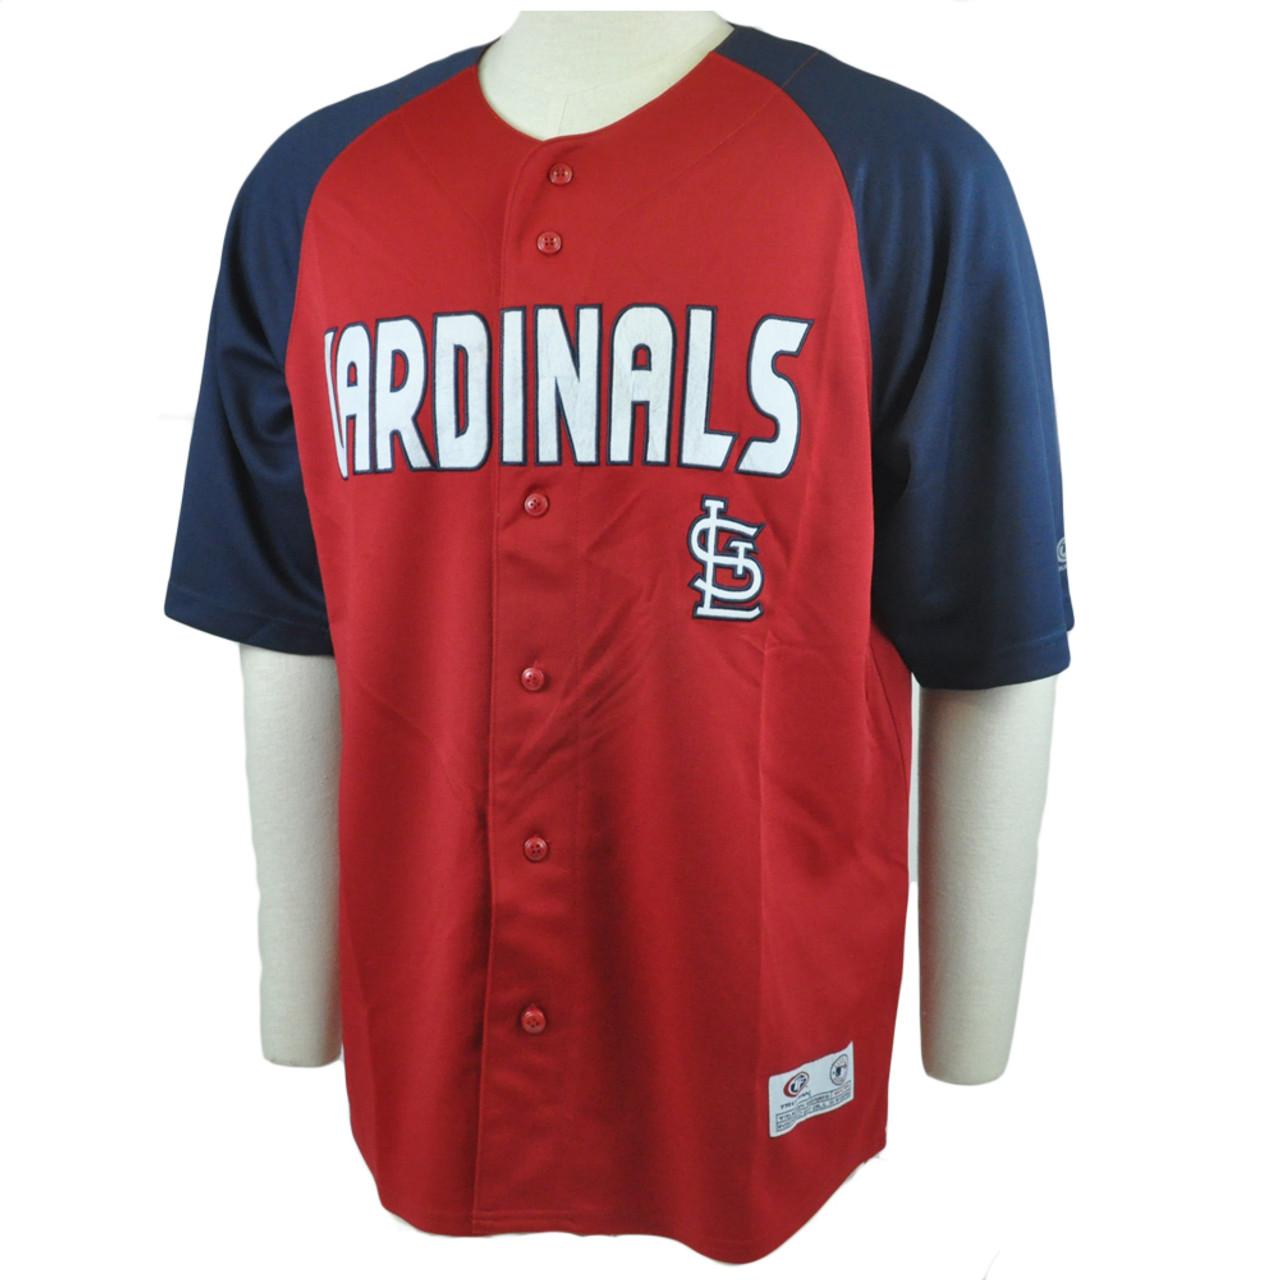 quality design 03cd8 58a66 MLB True Fan St Louis Cardinals Felt Applique Authentic Licensed Jersey  Large LG